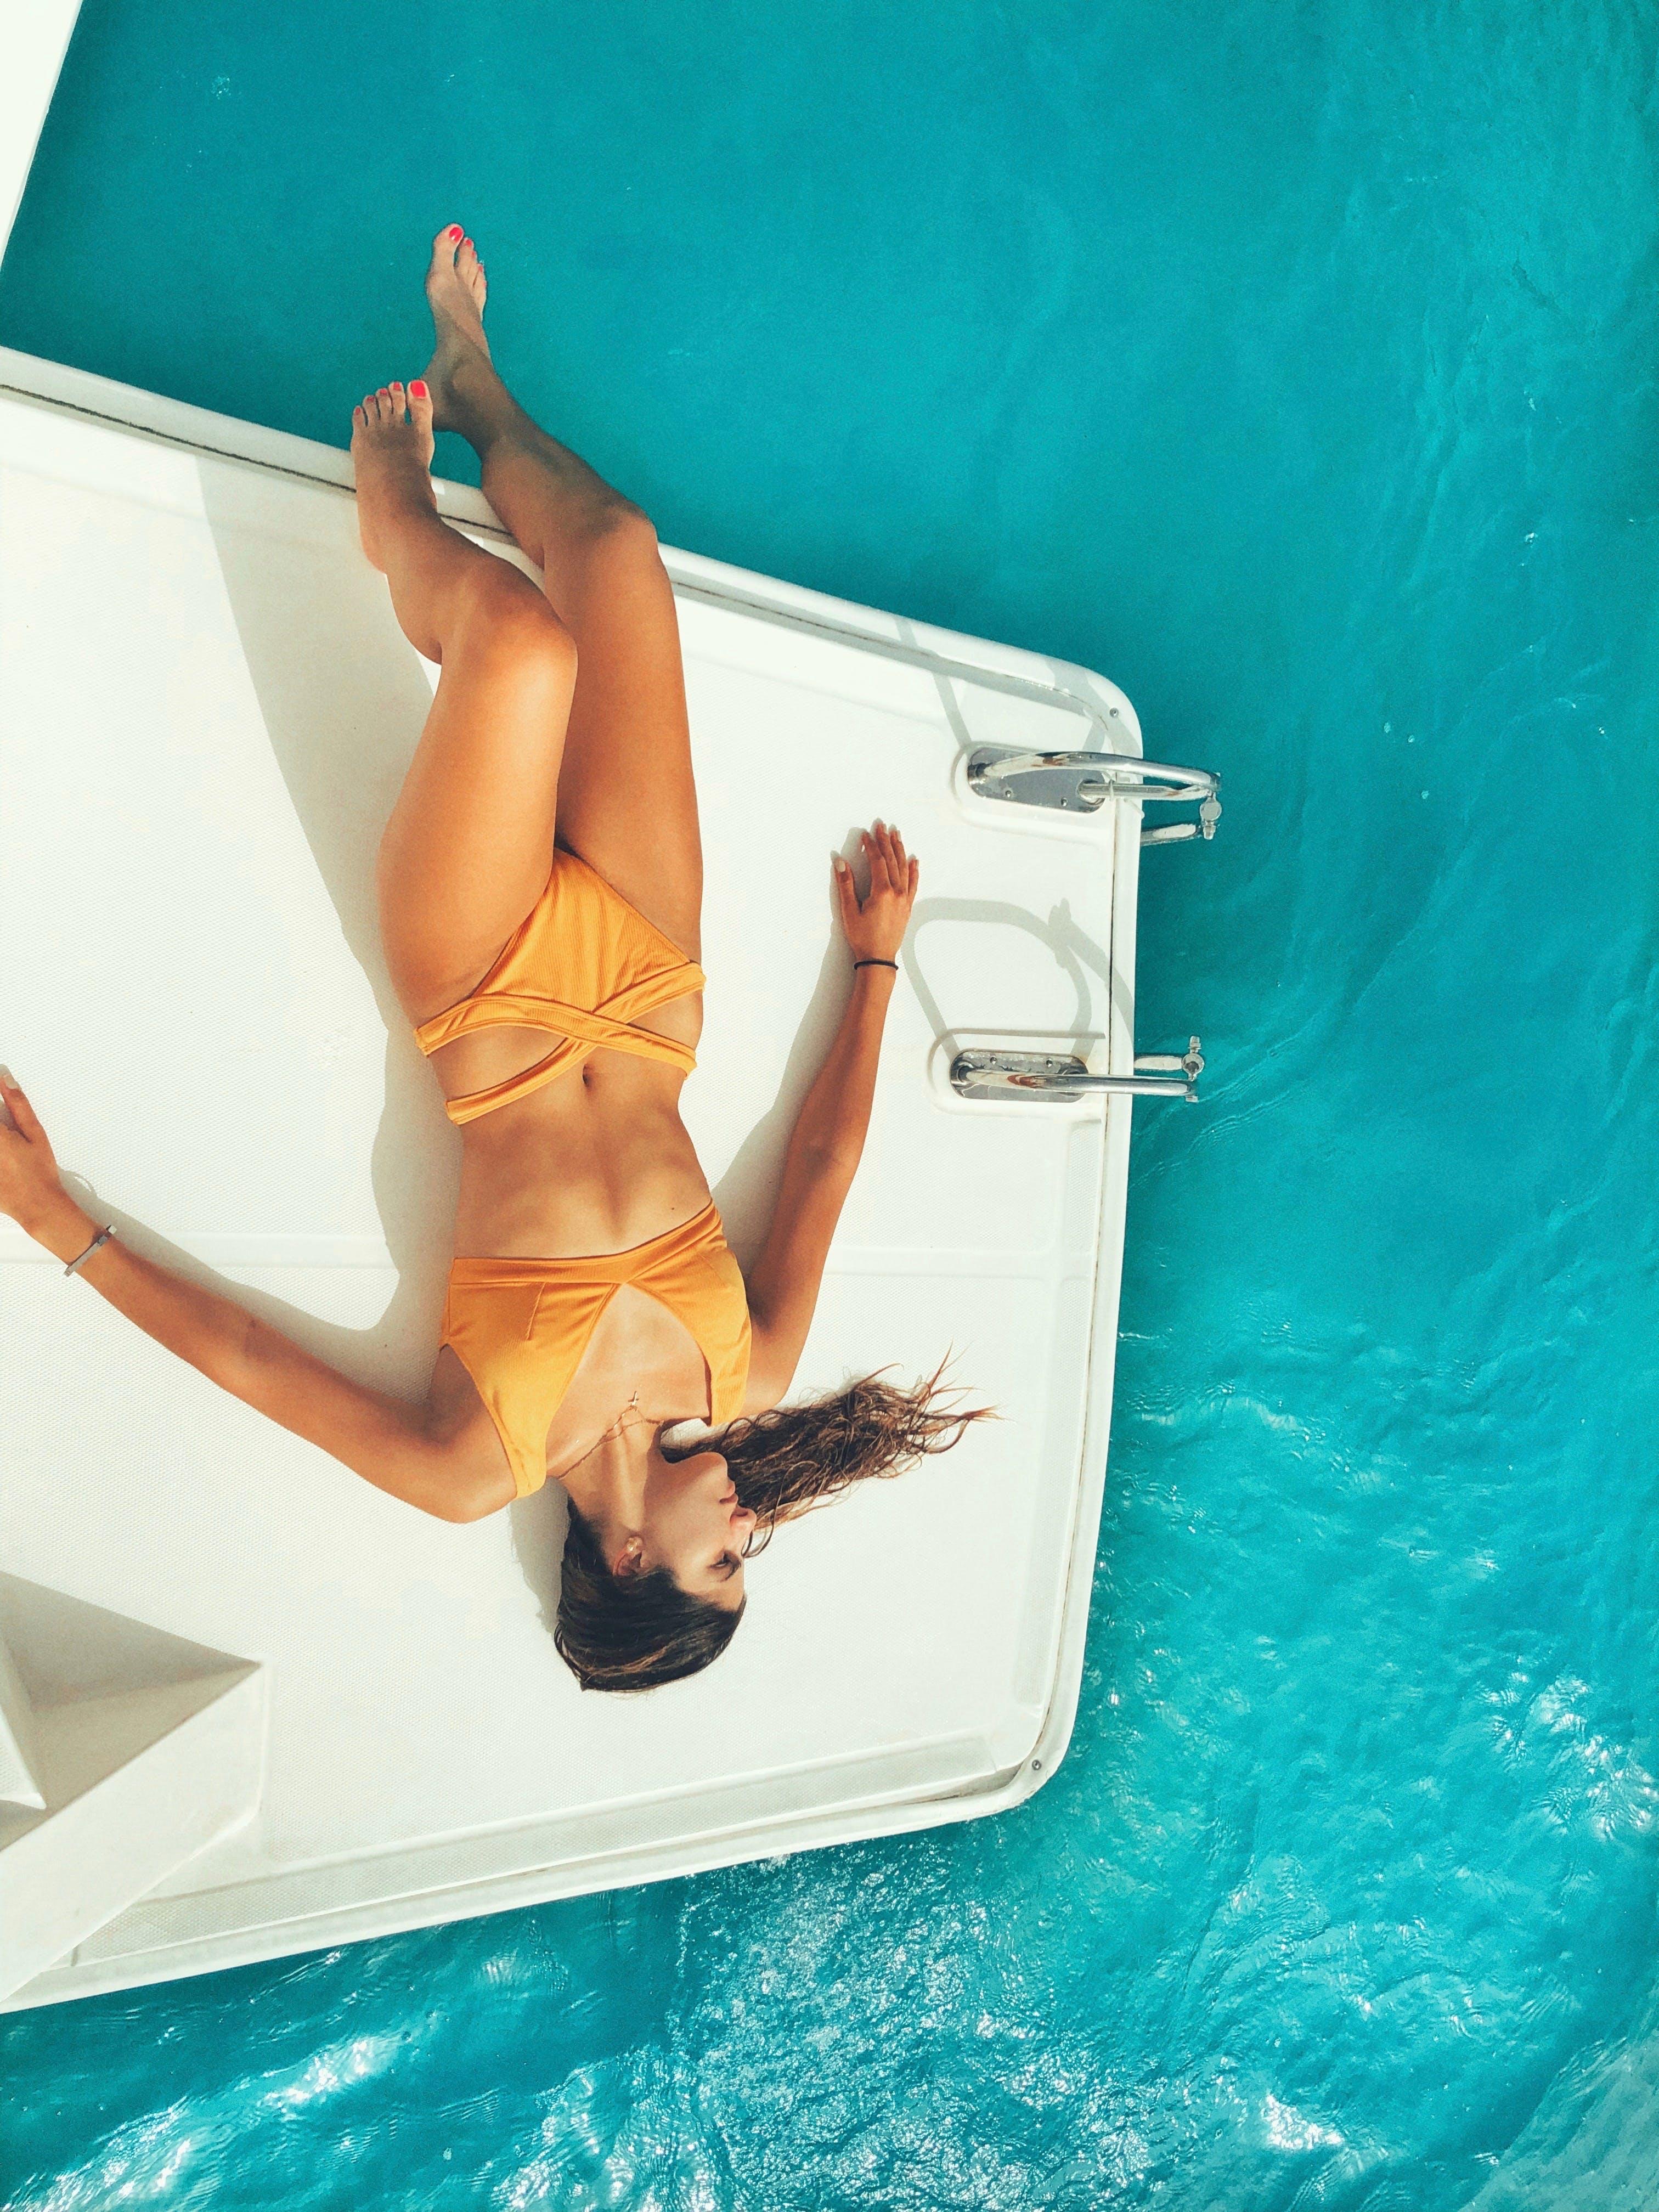 Kostenloses Stock Foto zu badeort, bikini, boot, bootsdeck